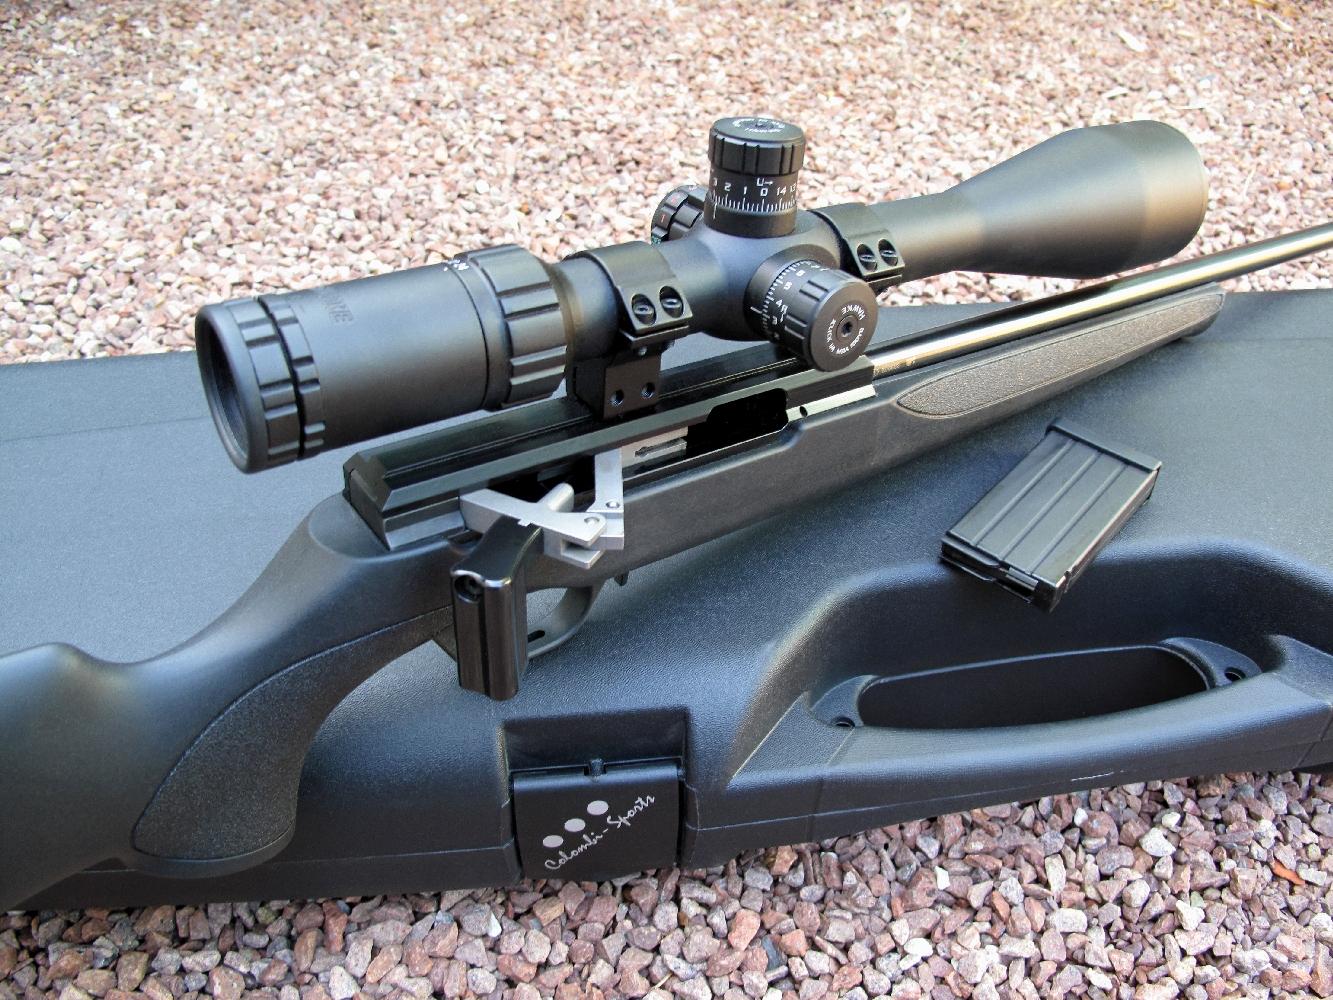 Essai armes carabine issc spa calibre 17 hmr for Salon armes